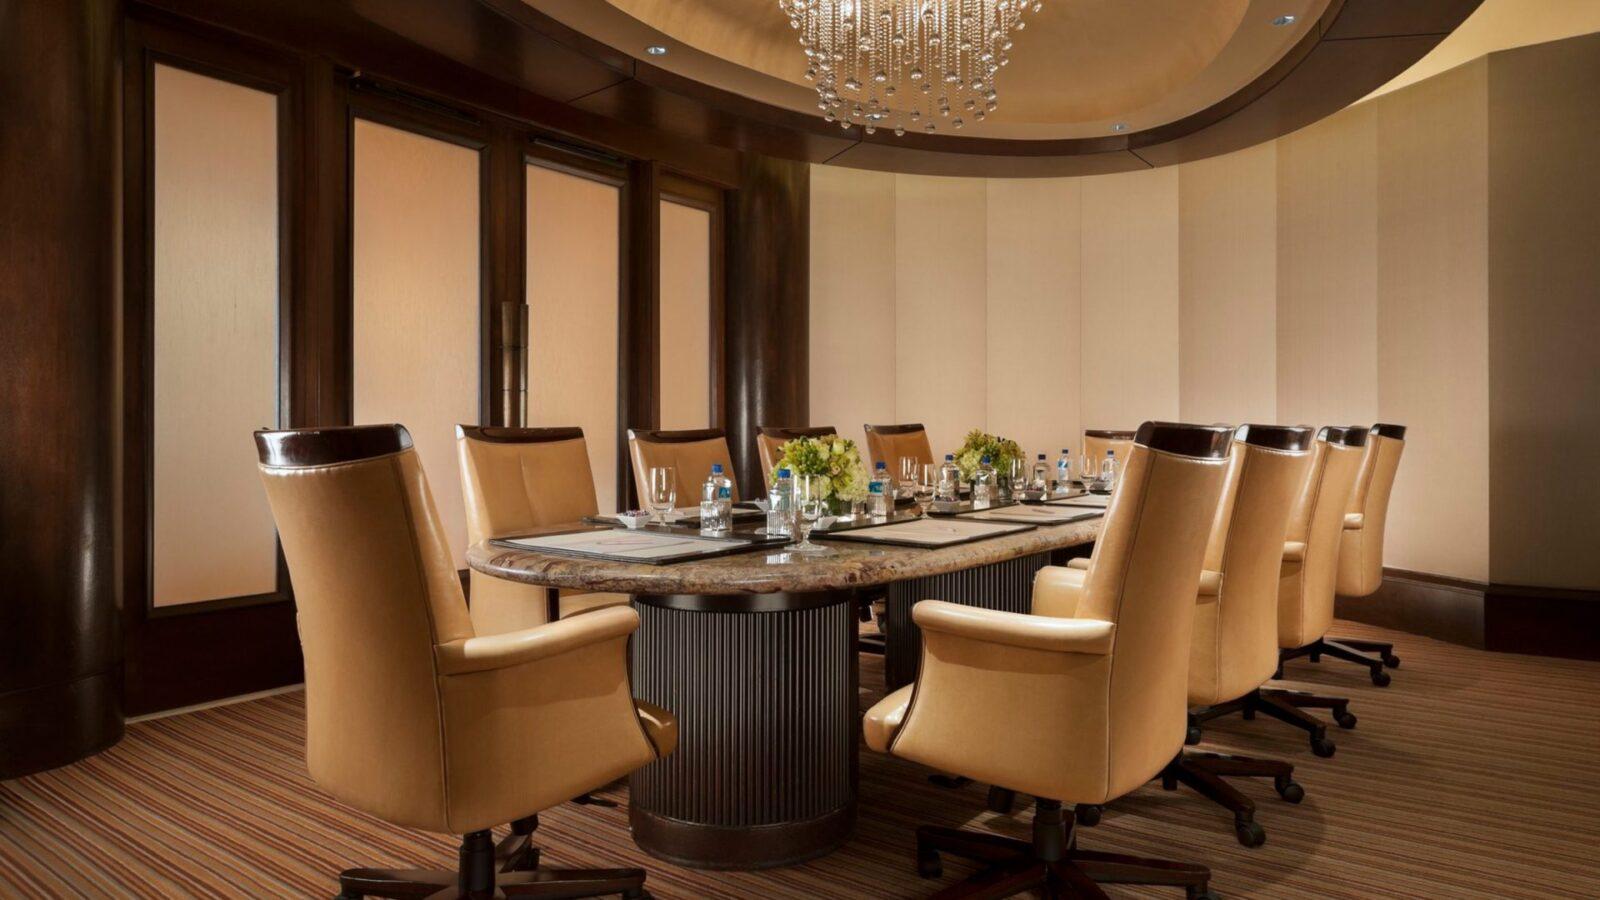 Where meetings happen